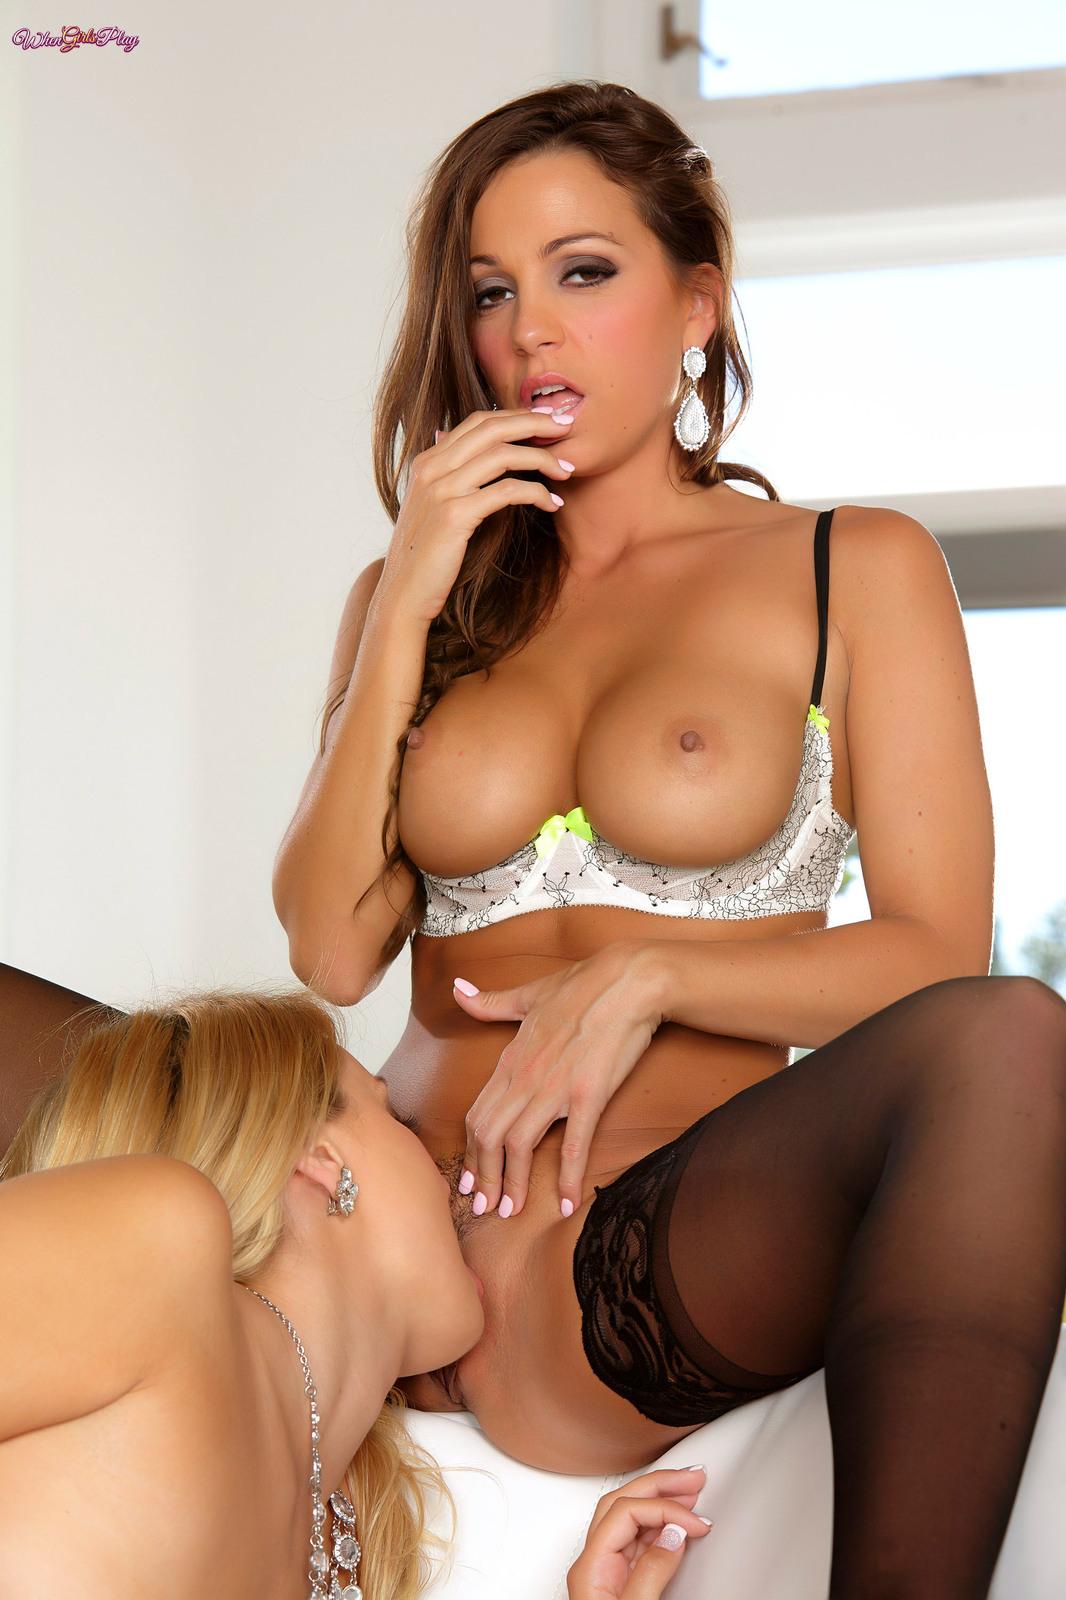 Hot american asian girl porn